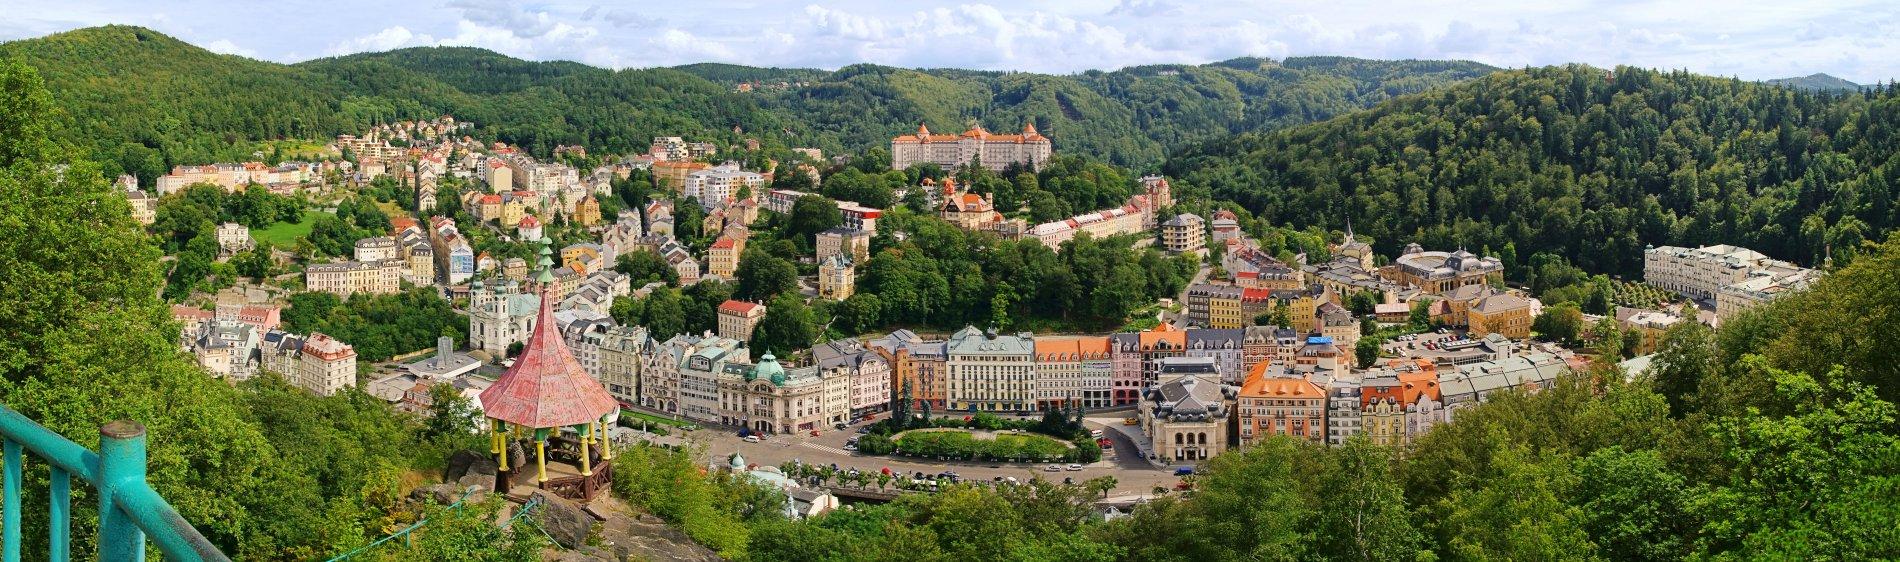 Prague to Karlovy Vary – Karlovy Vary Day Trip